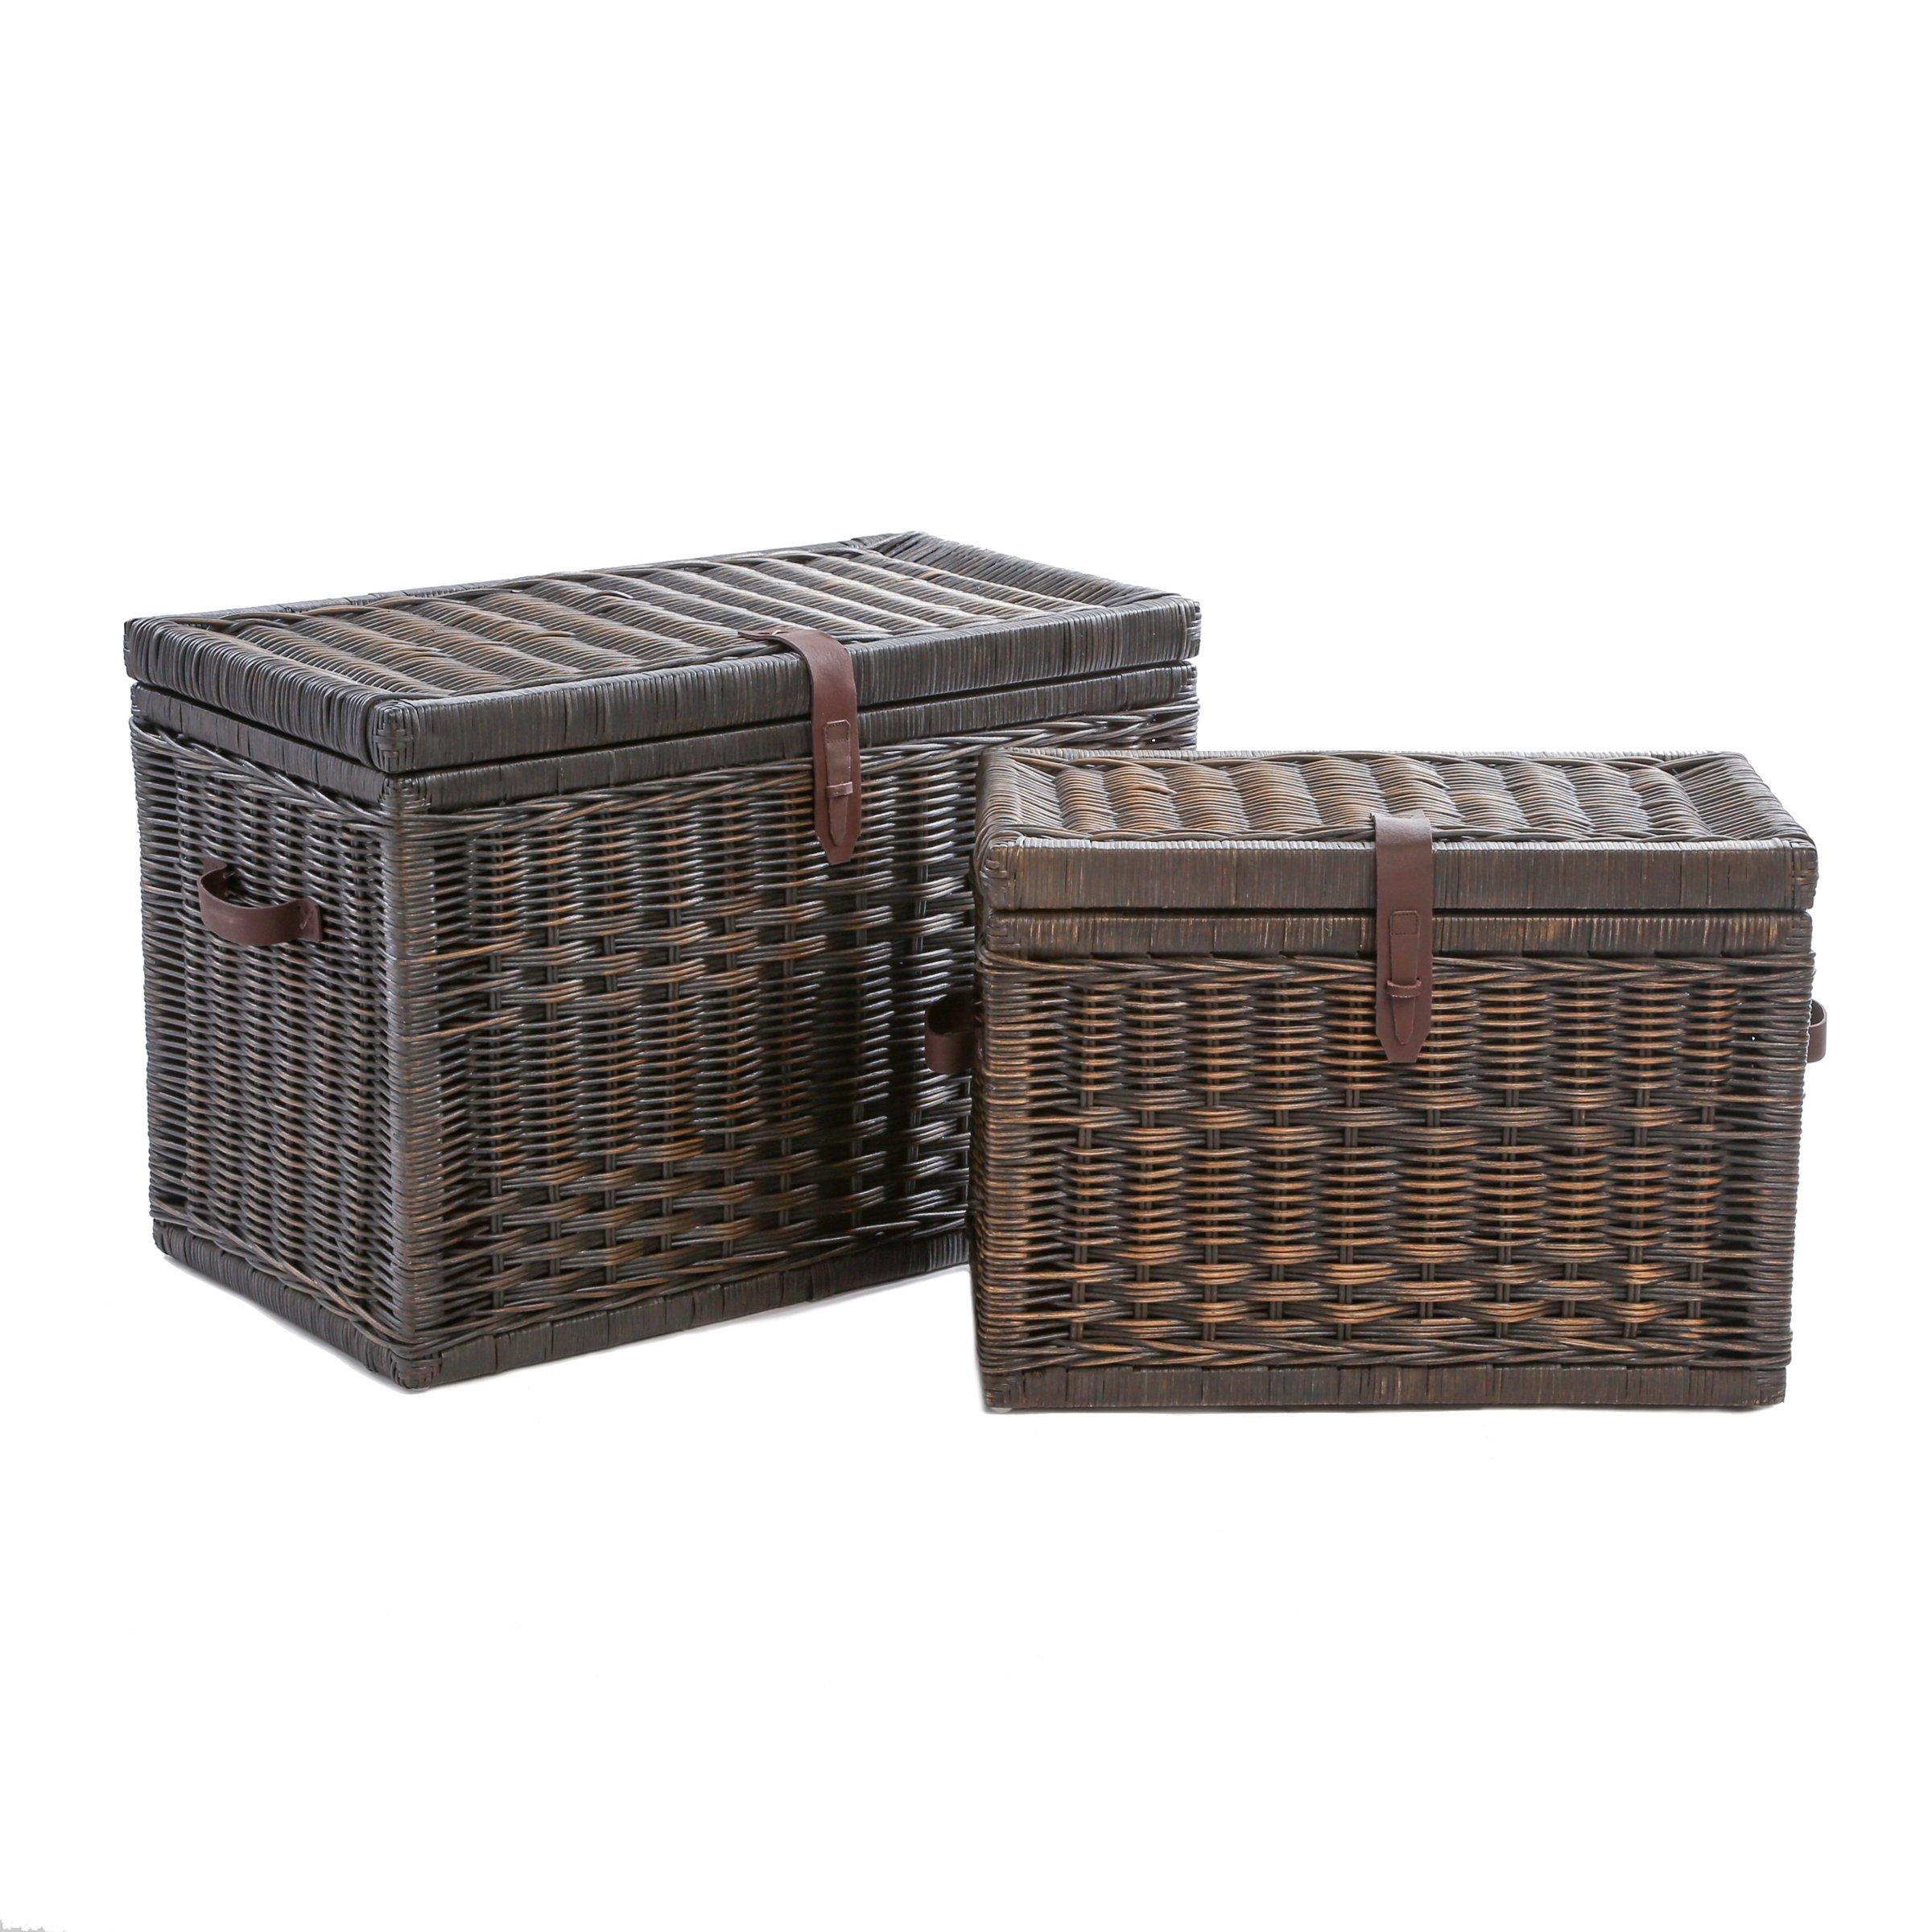 The Basket Lady Wicker Storage Trunk   Wicker Storage Chest, Large, Antique Walnut Brown by The Basket Lady (Image #3)